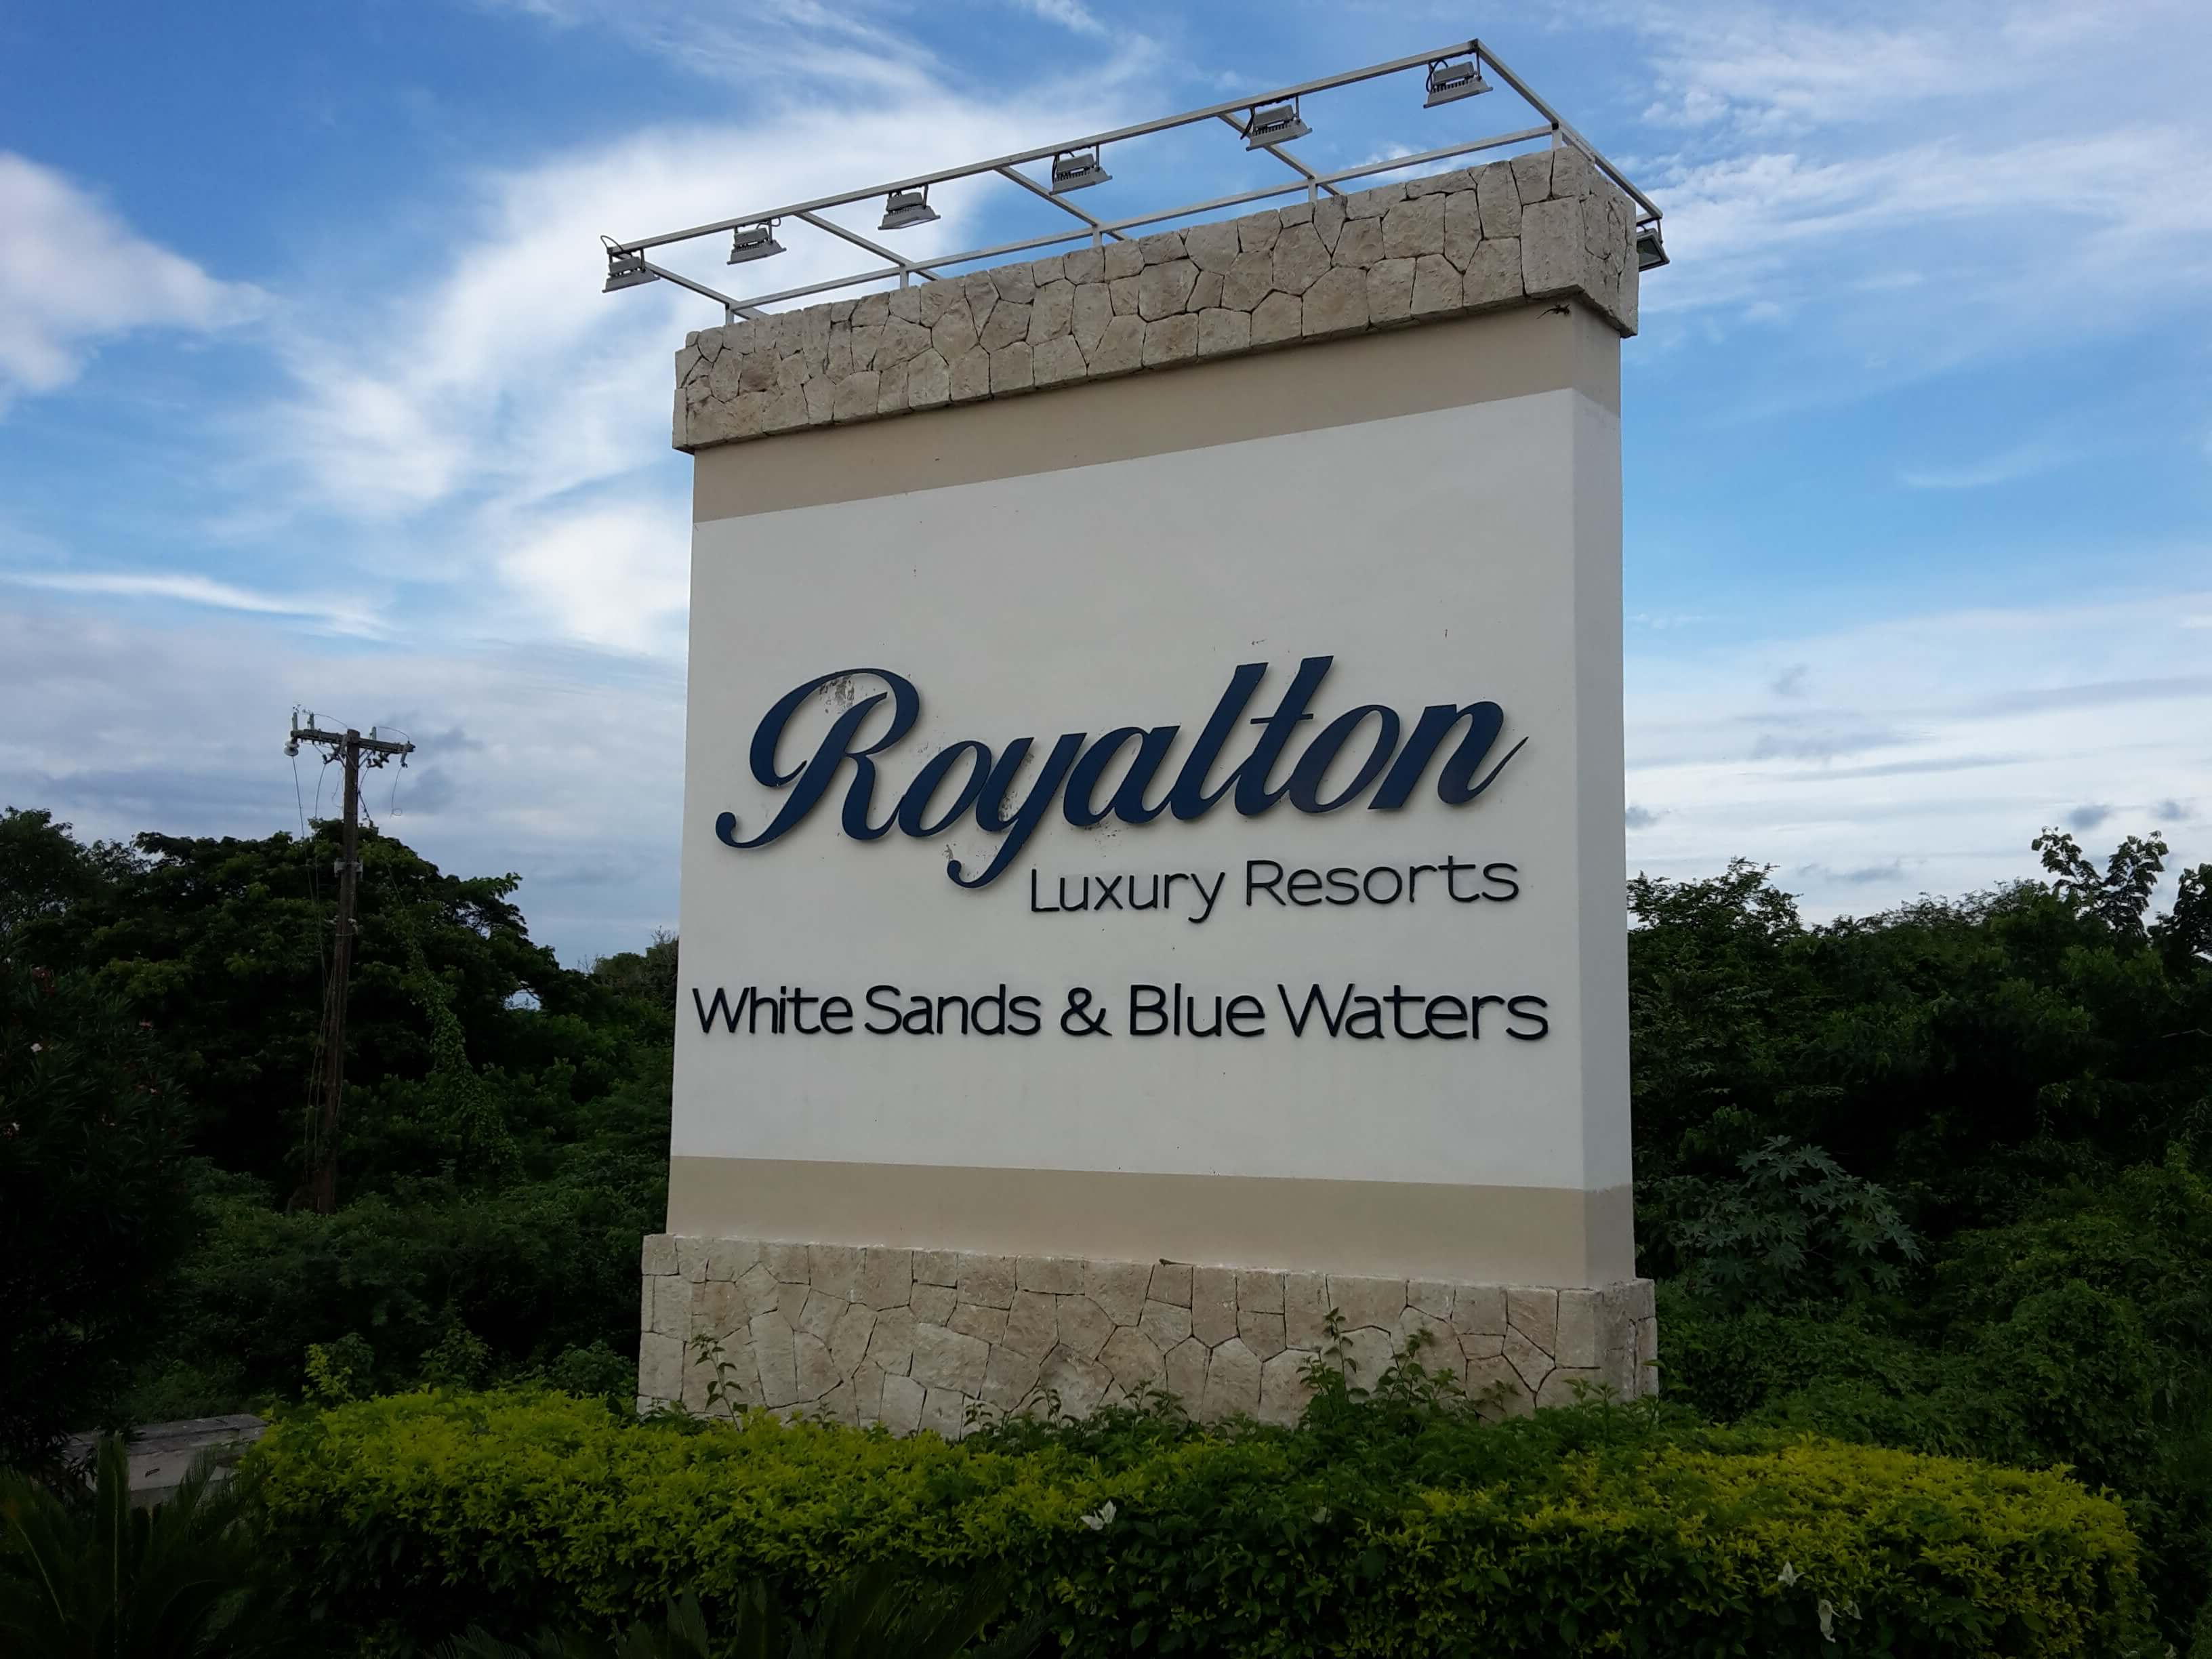 jamaica_all_inclusive_resorts_royalton